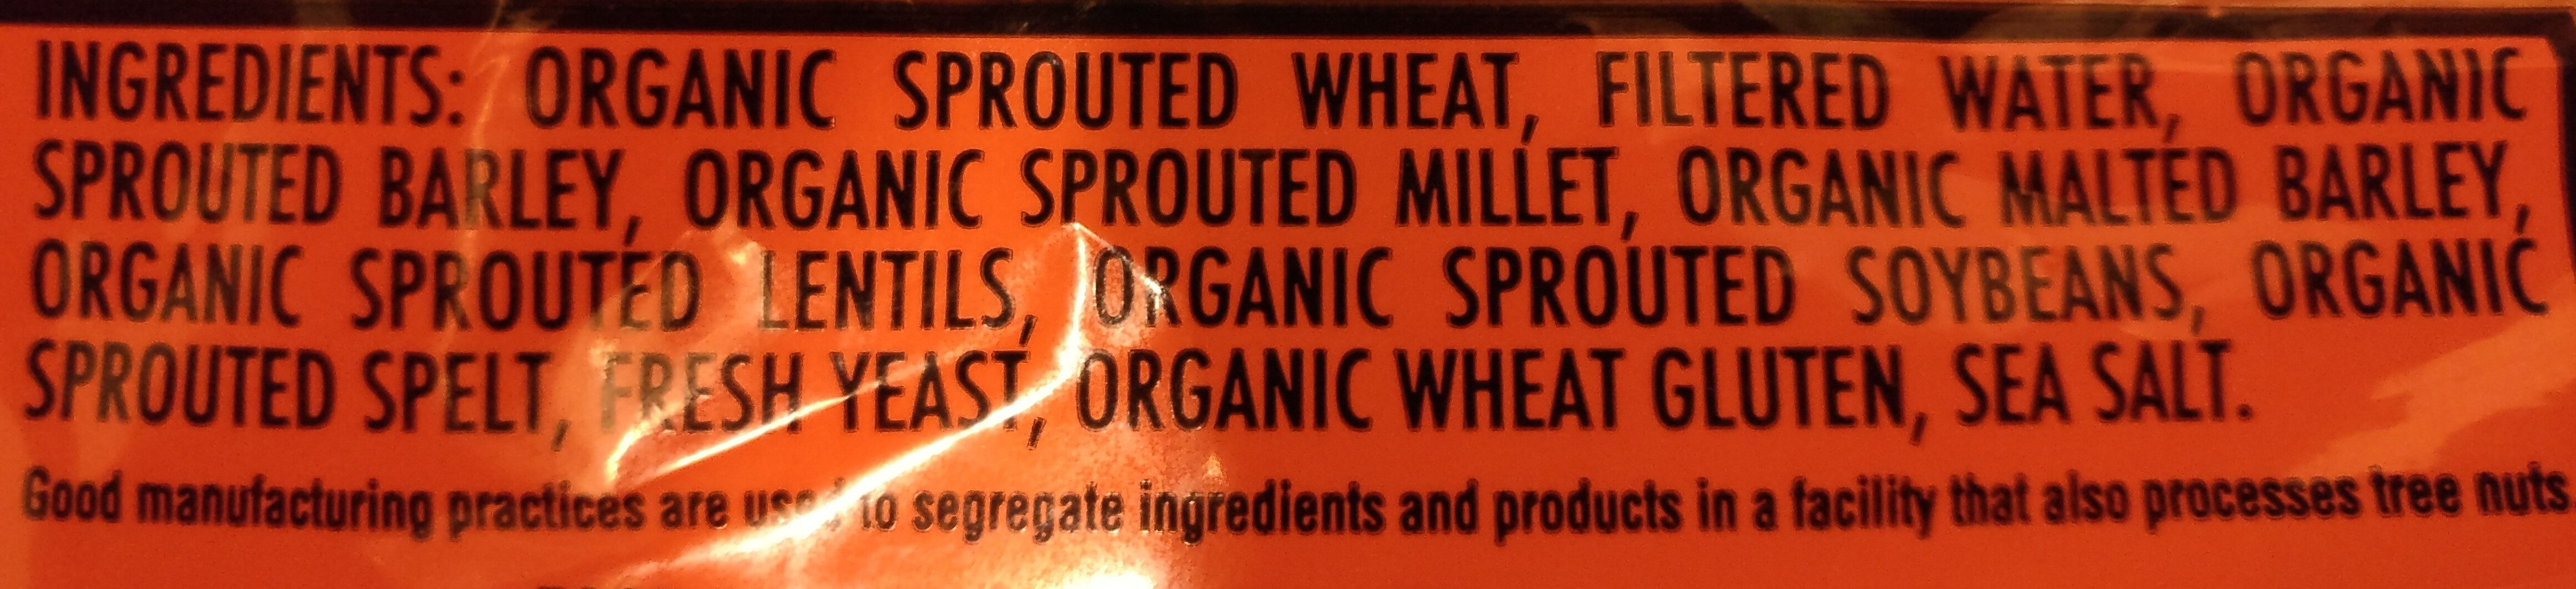 Sprouted 100% whole grain bread - Ingredients - en